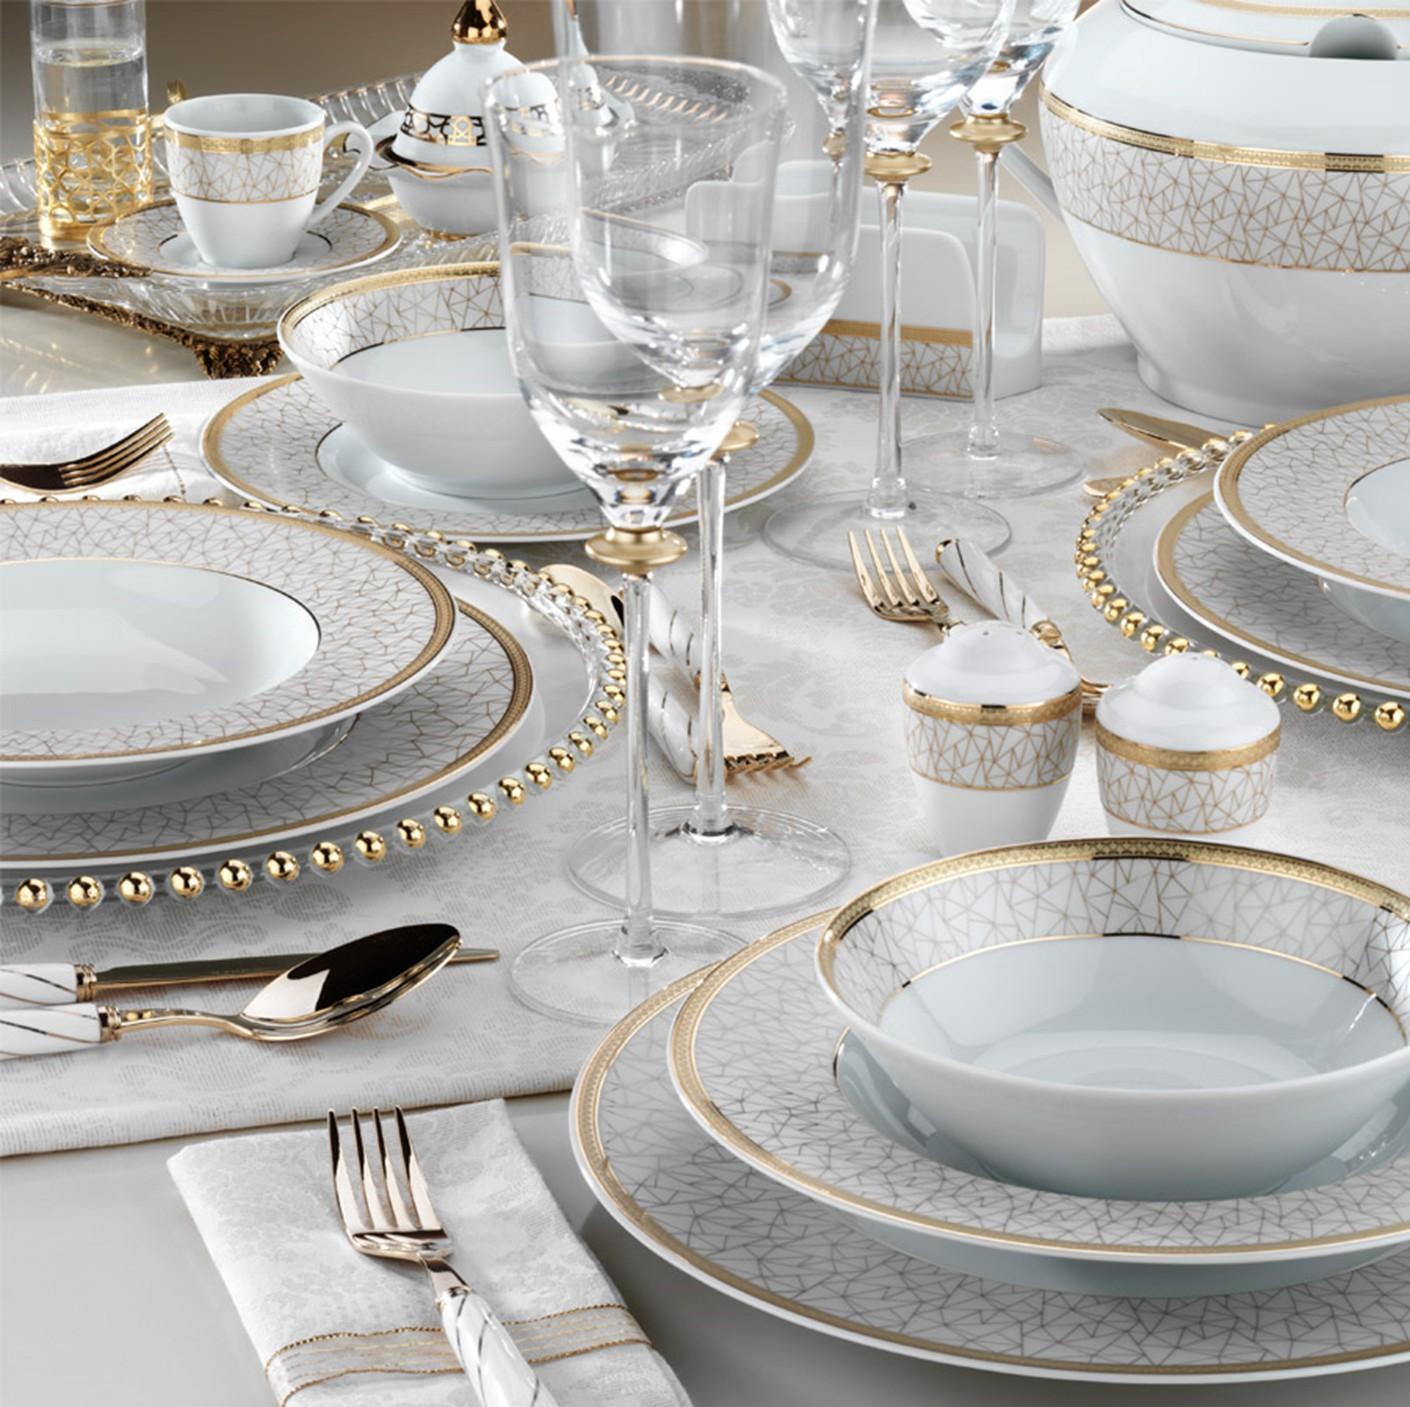 Kutahya Porselen FINE BONE Patterned 82 Pieces 8690 Dinnerware Set